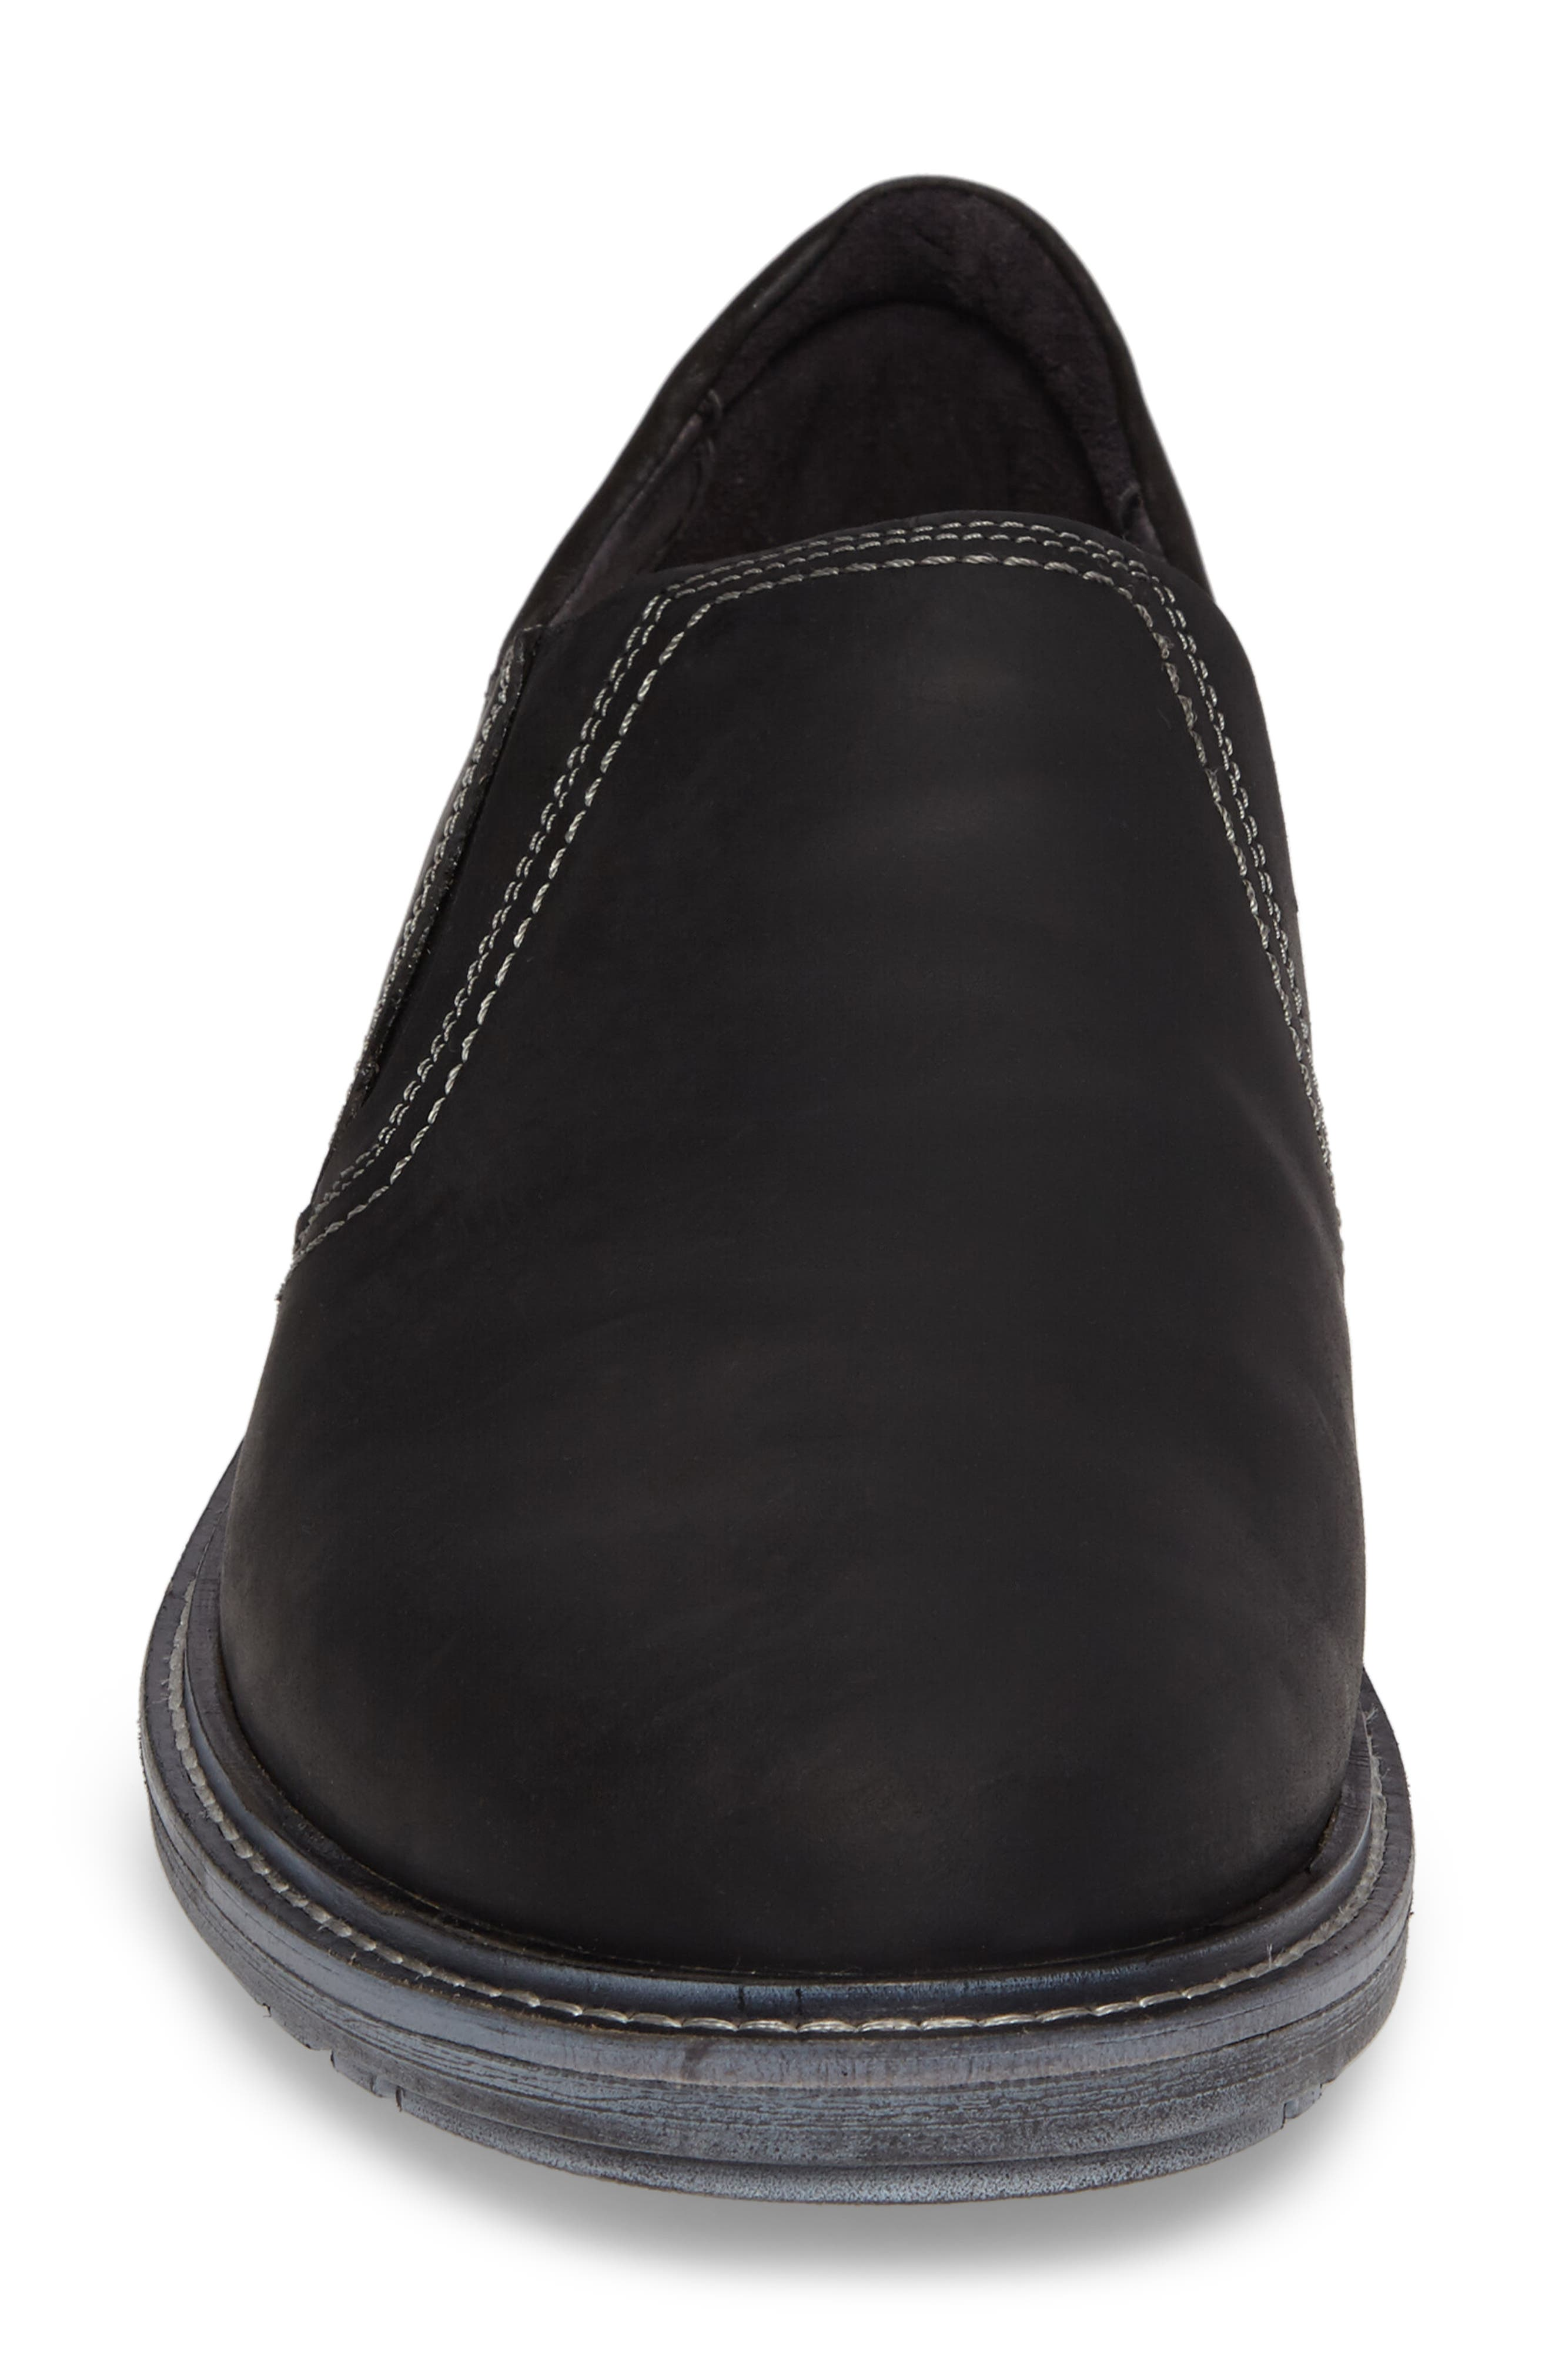 Manyara Slip-On Loafer,                             Alternate thumbnail 4, color,                             COAL LEATHER